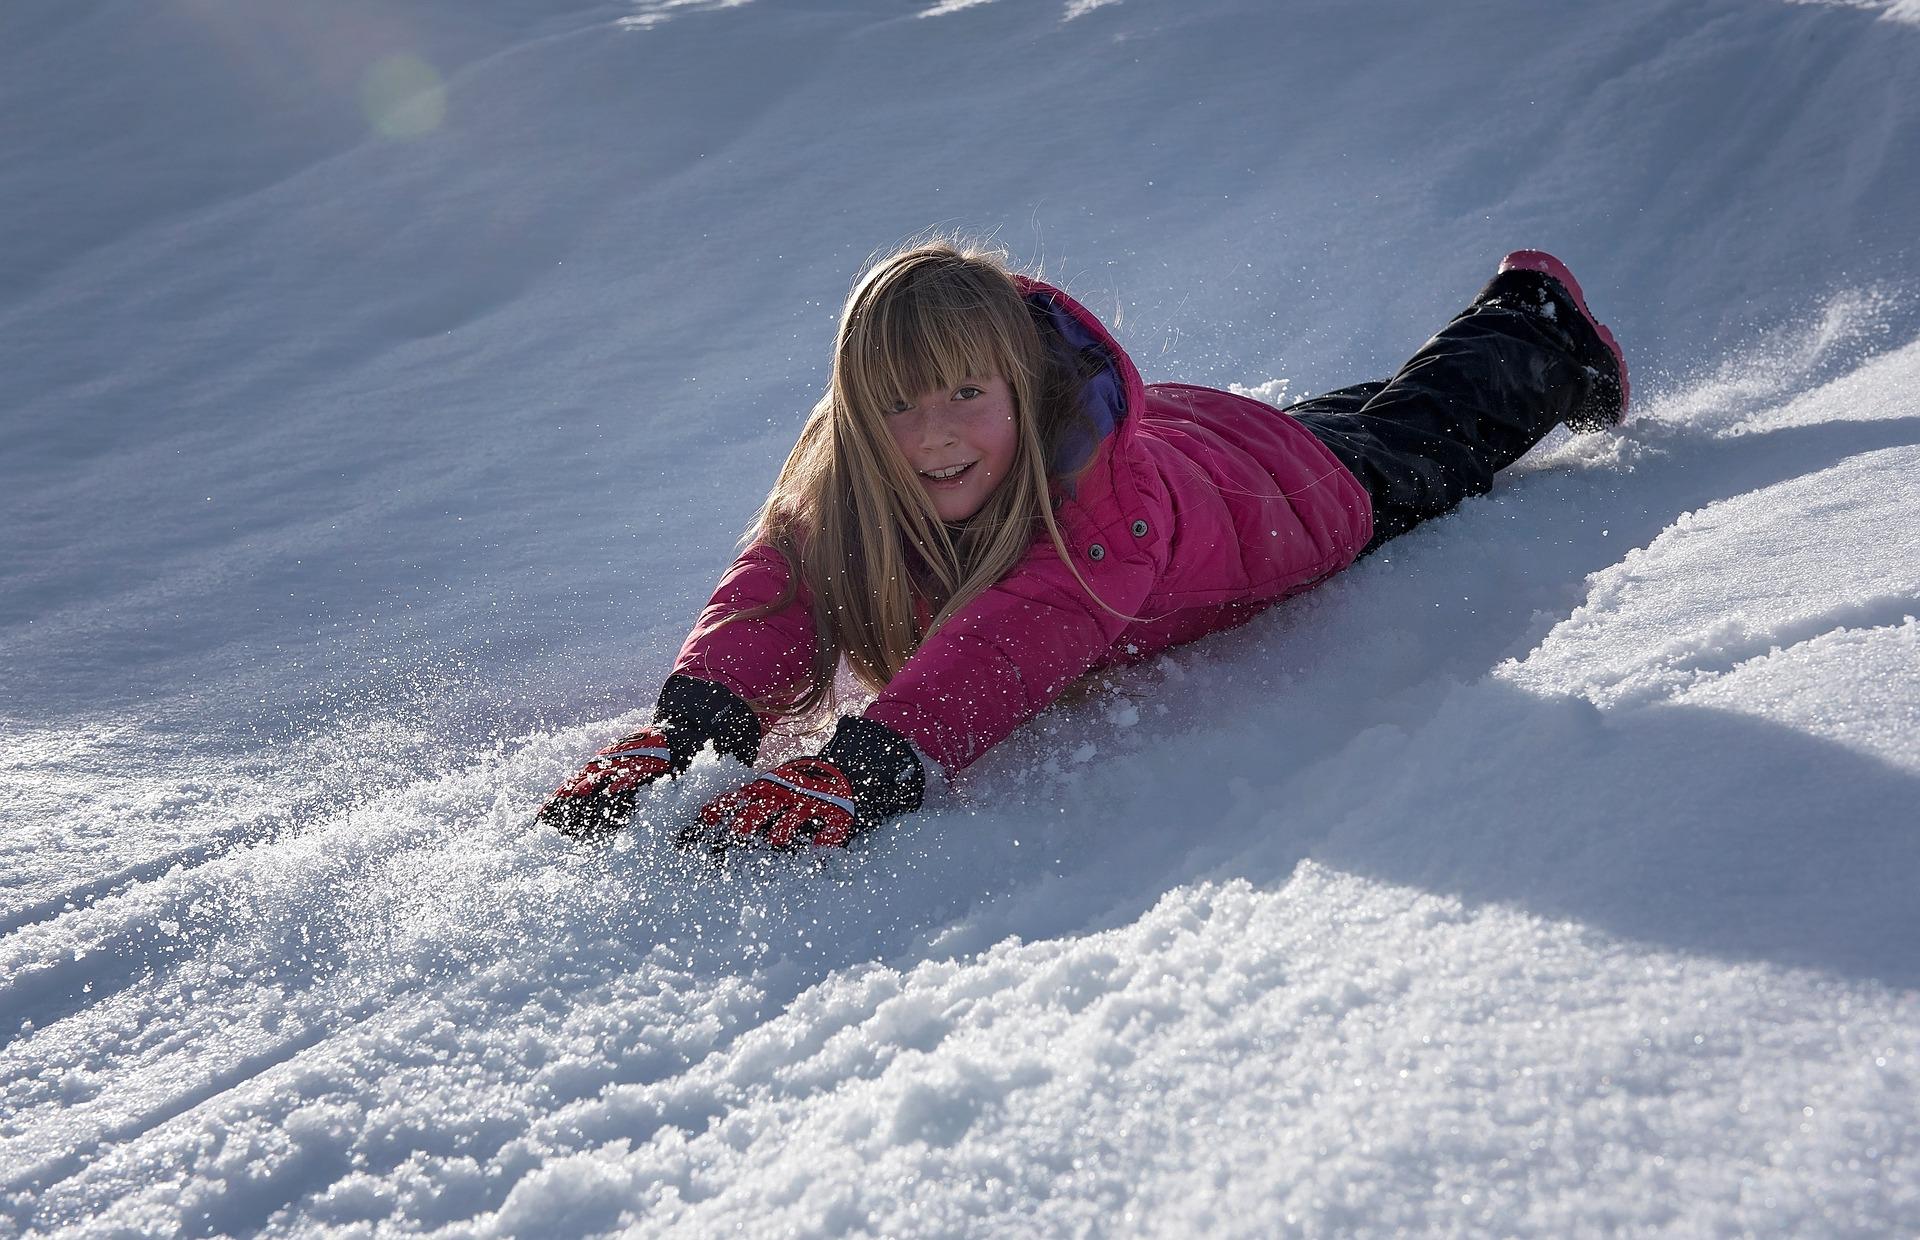 https://pixabay.com/en/child-girl-winter-snow-slip-fun-1219700/